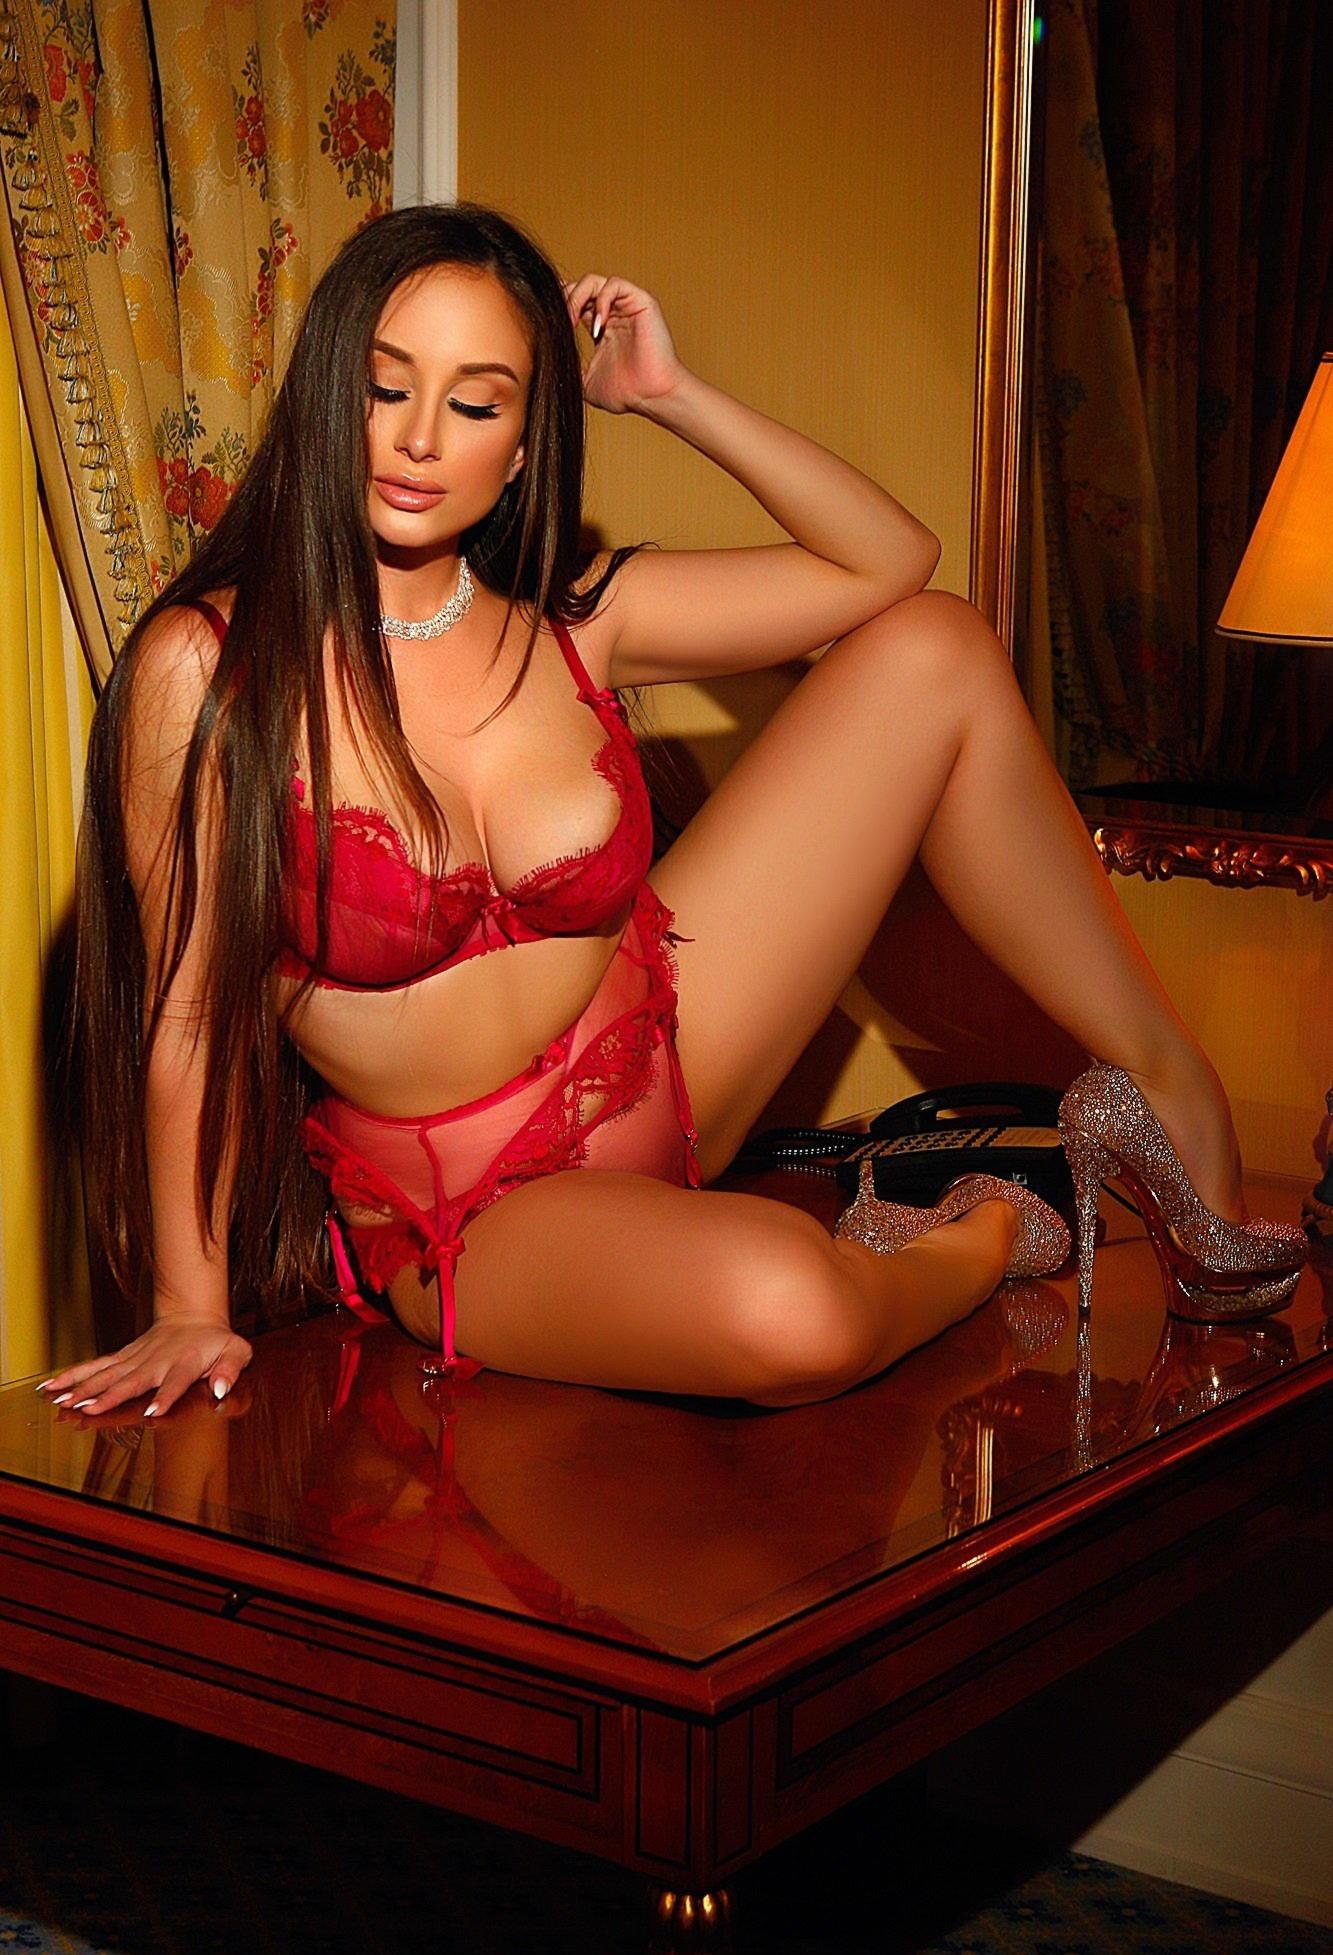 Проститутки эскорт услуги проститутки шлюхи тюмень